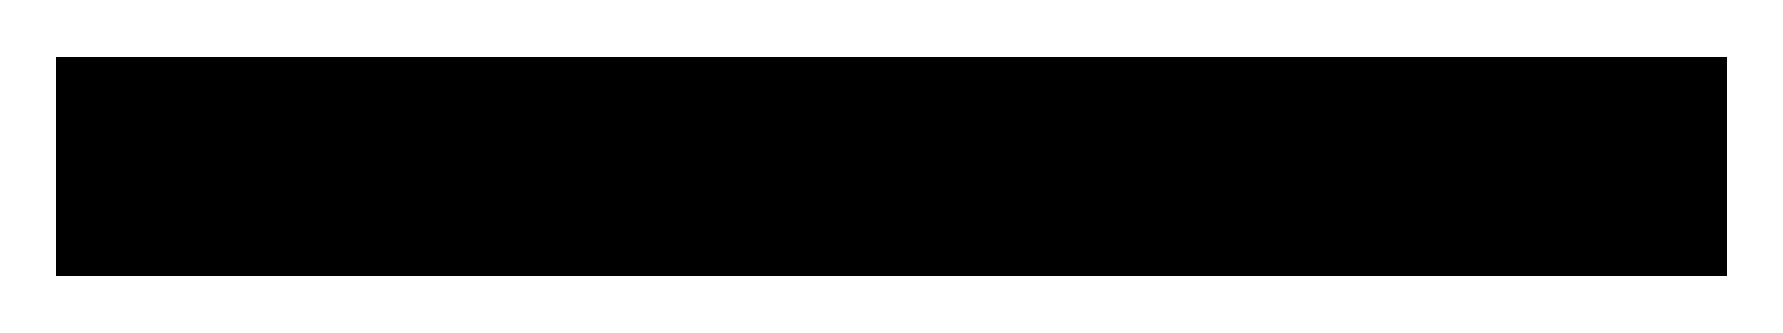 feral-labs-logo_basic-black-rgb.png